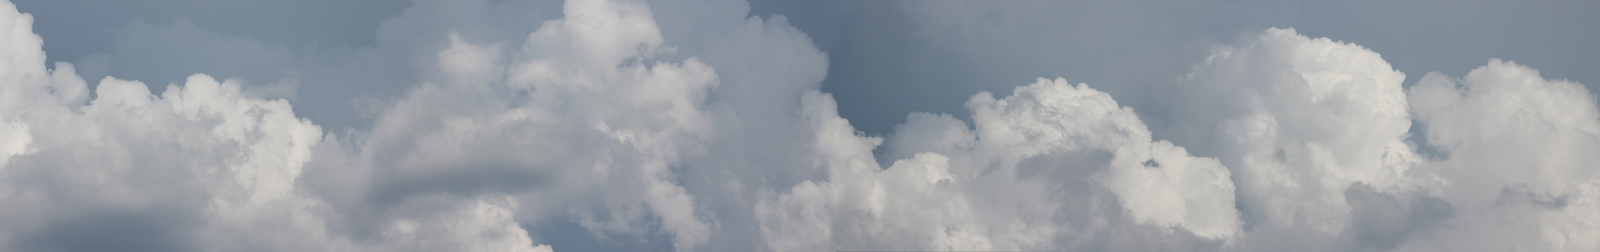 Thunder on the Horizon by Honey-Hill